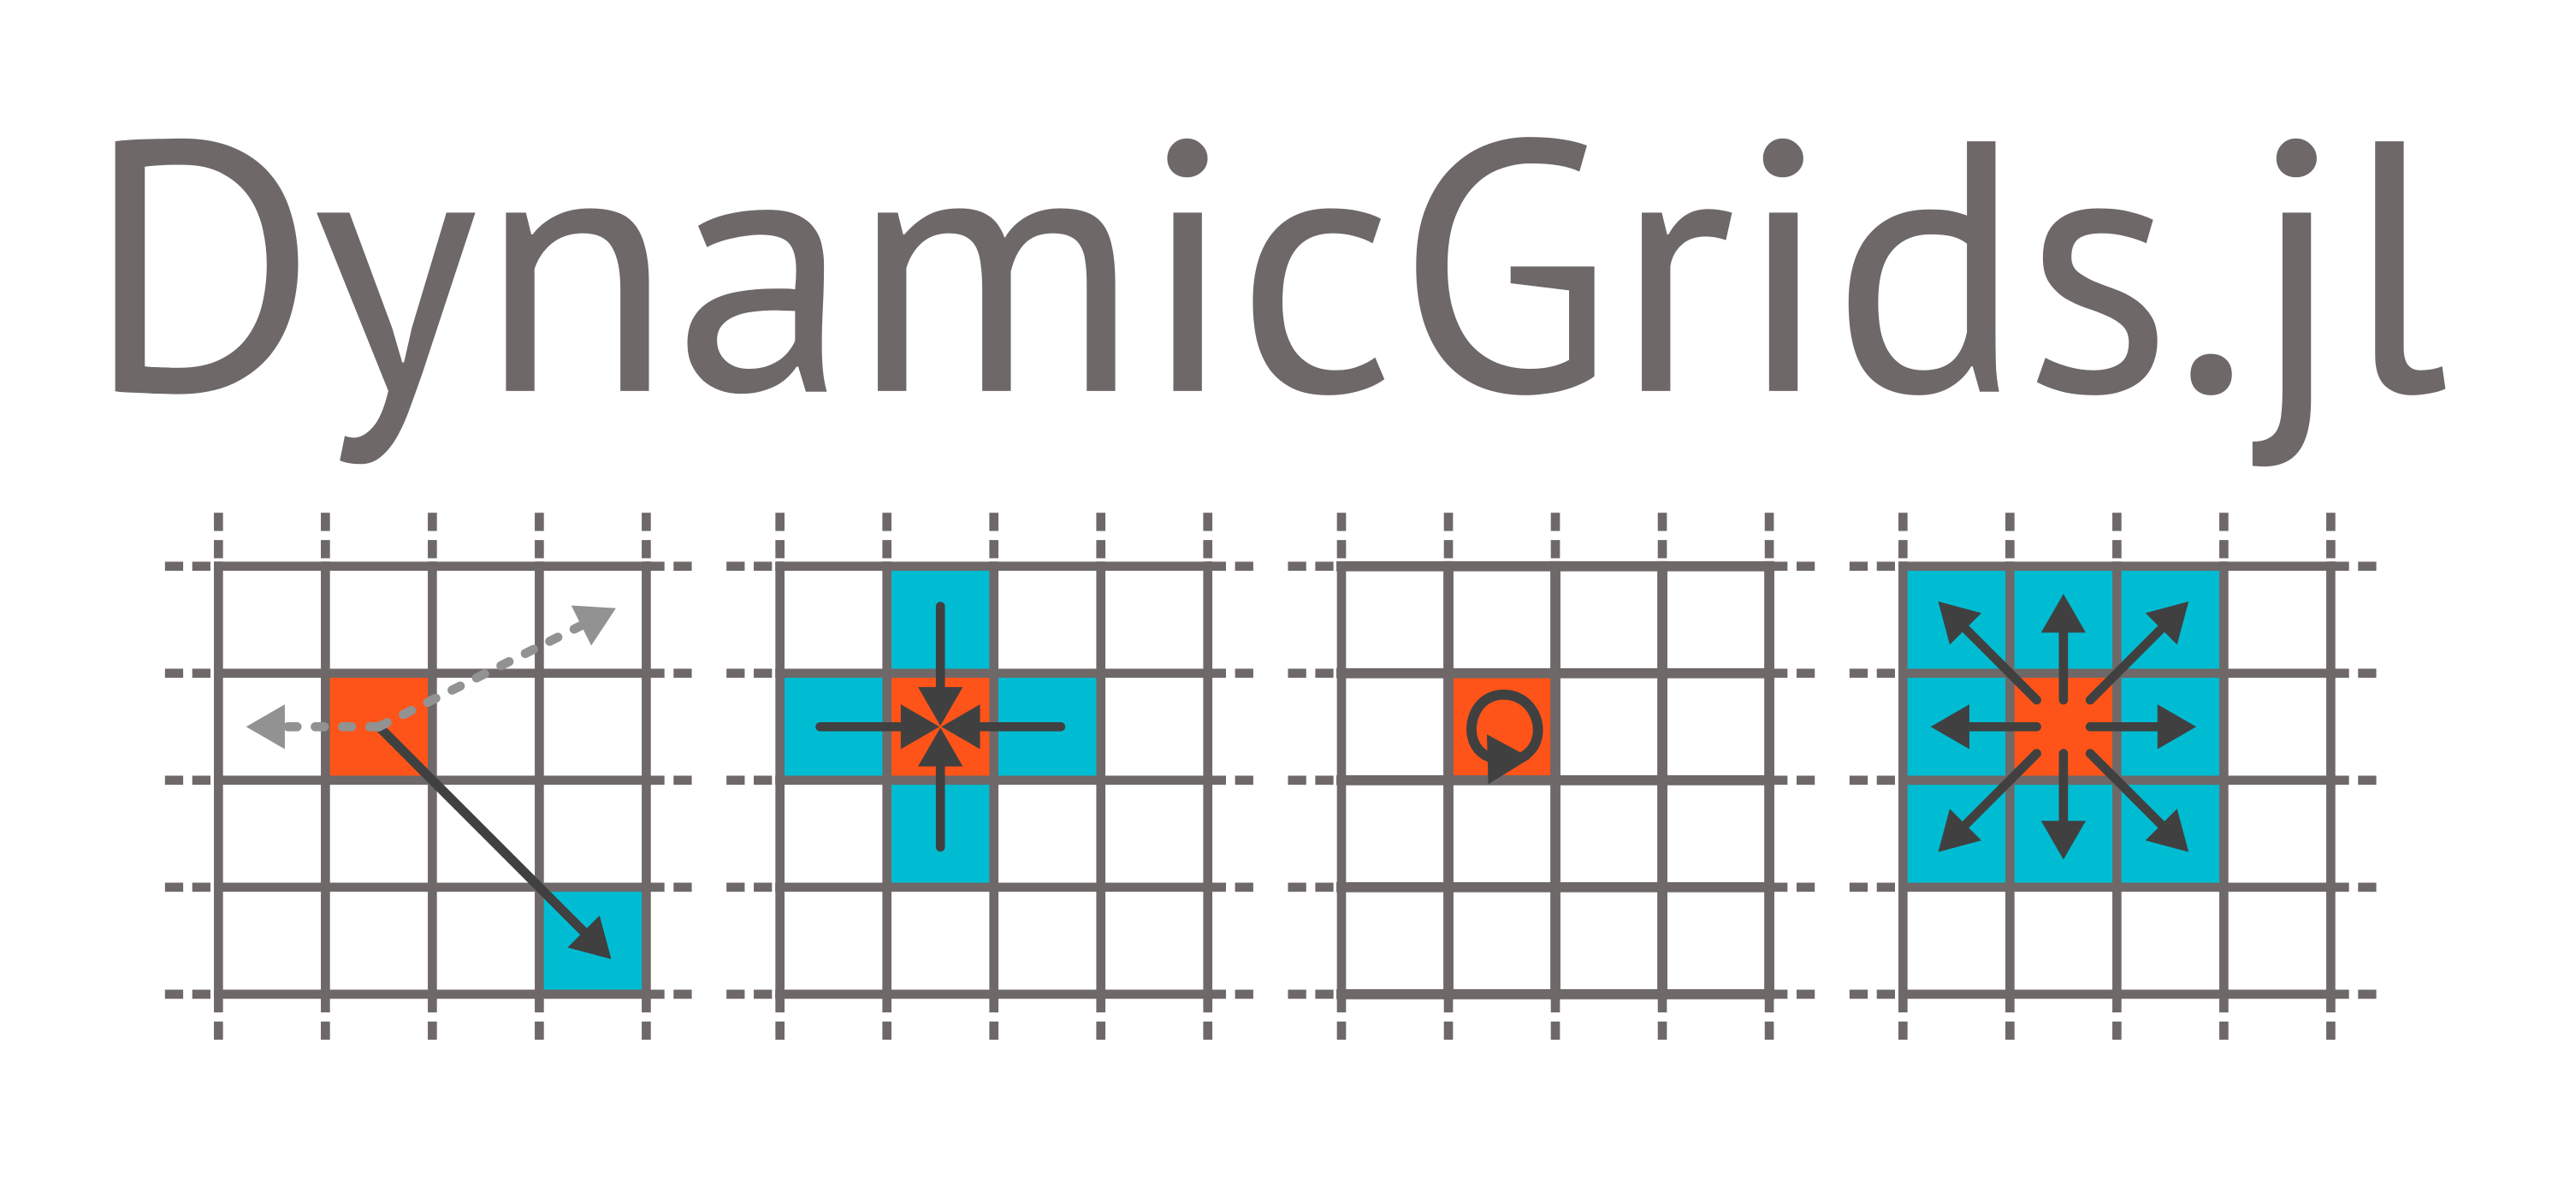 DynamicGrids